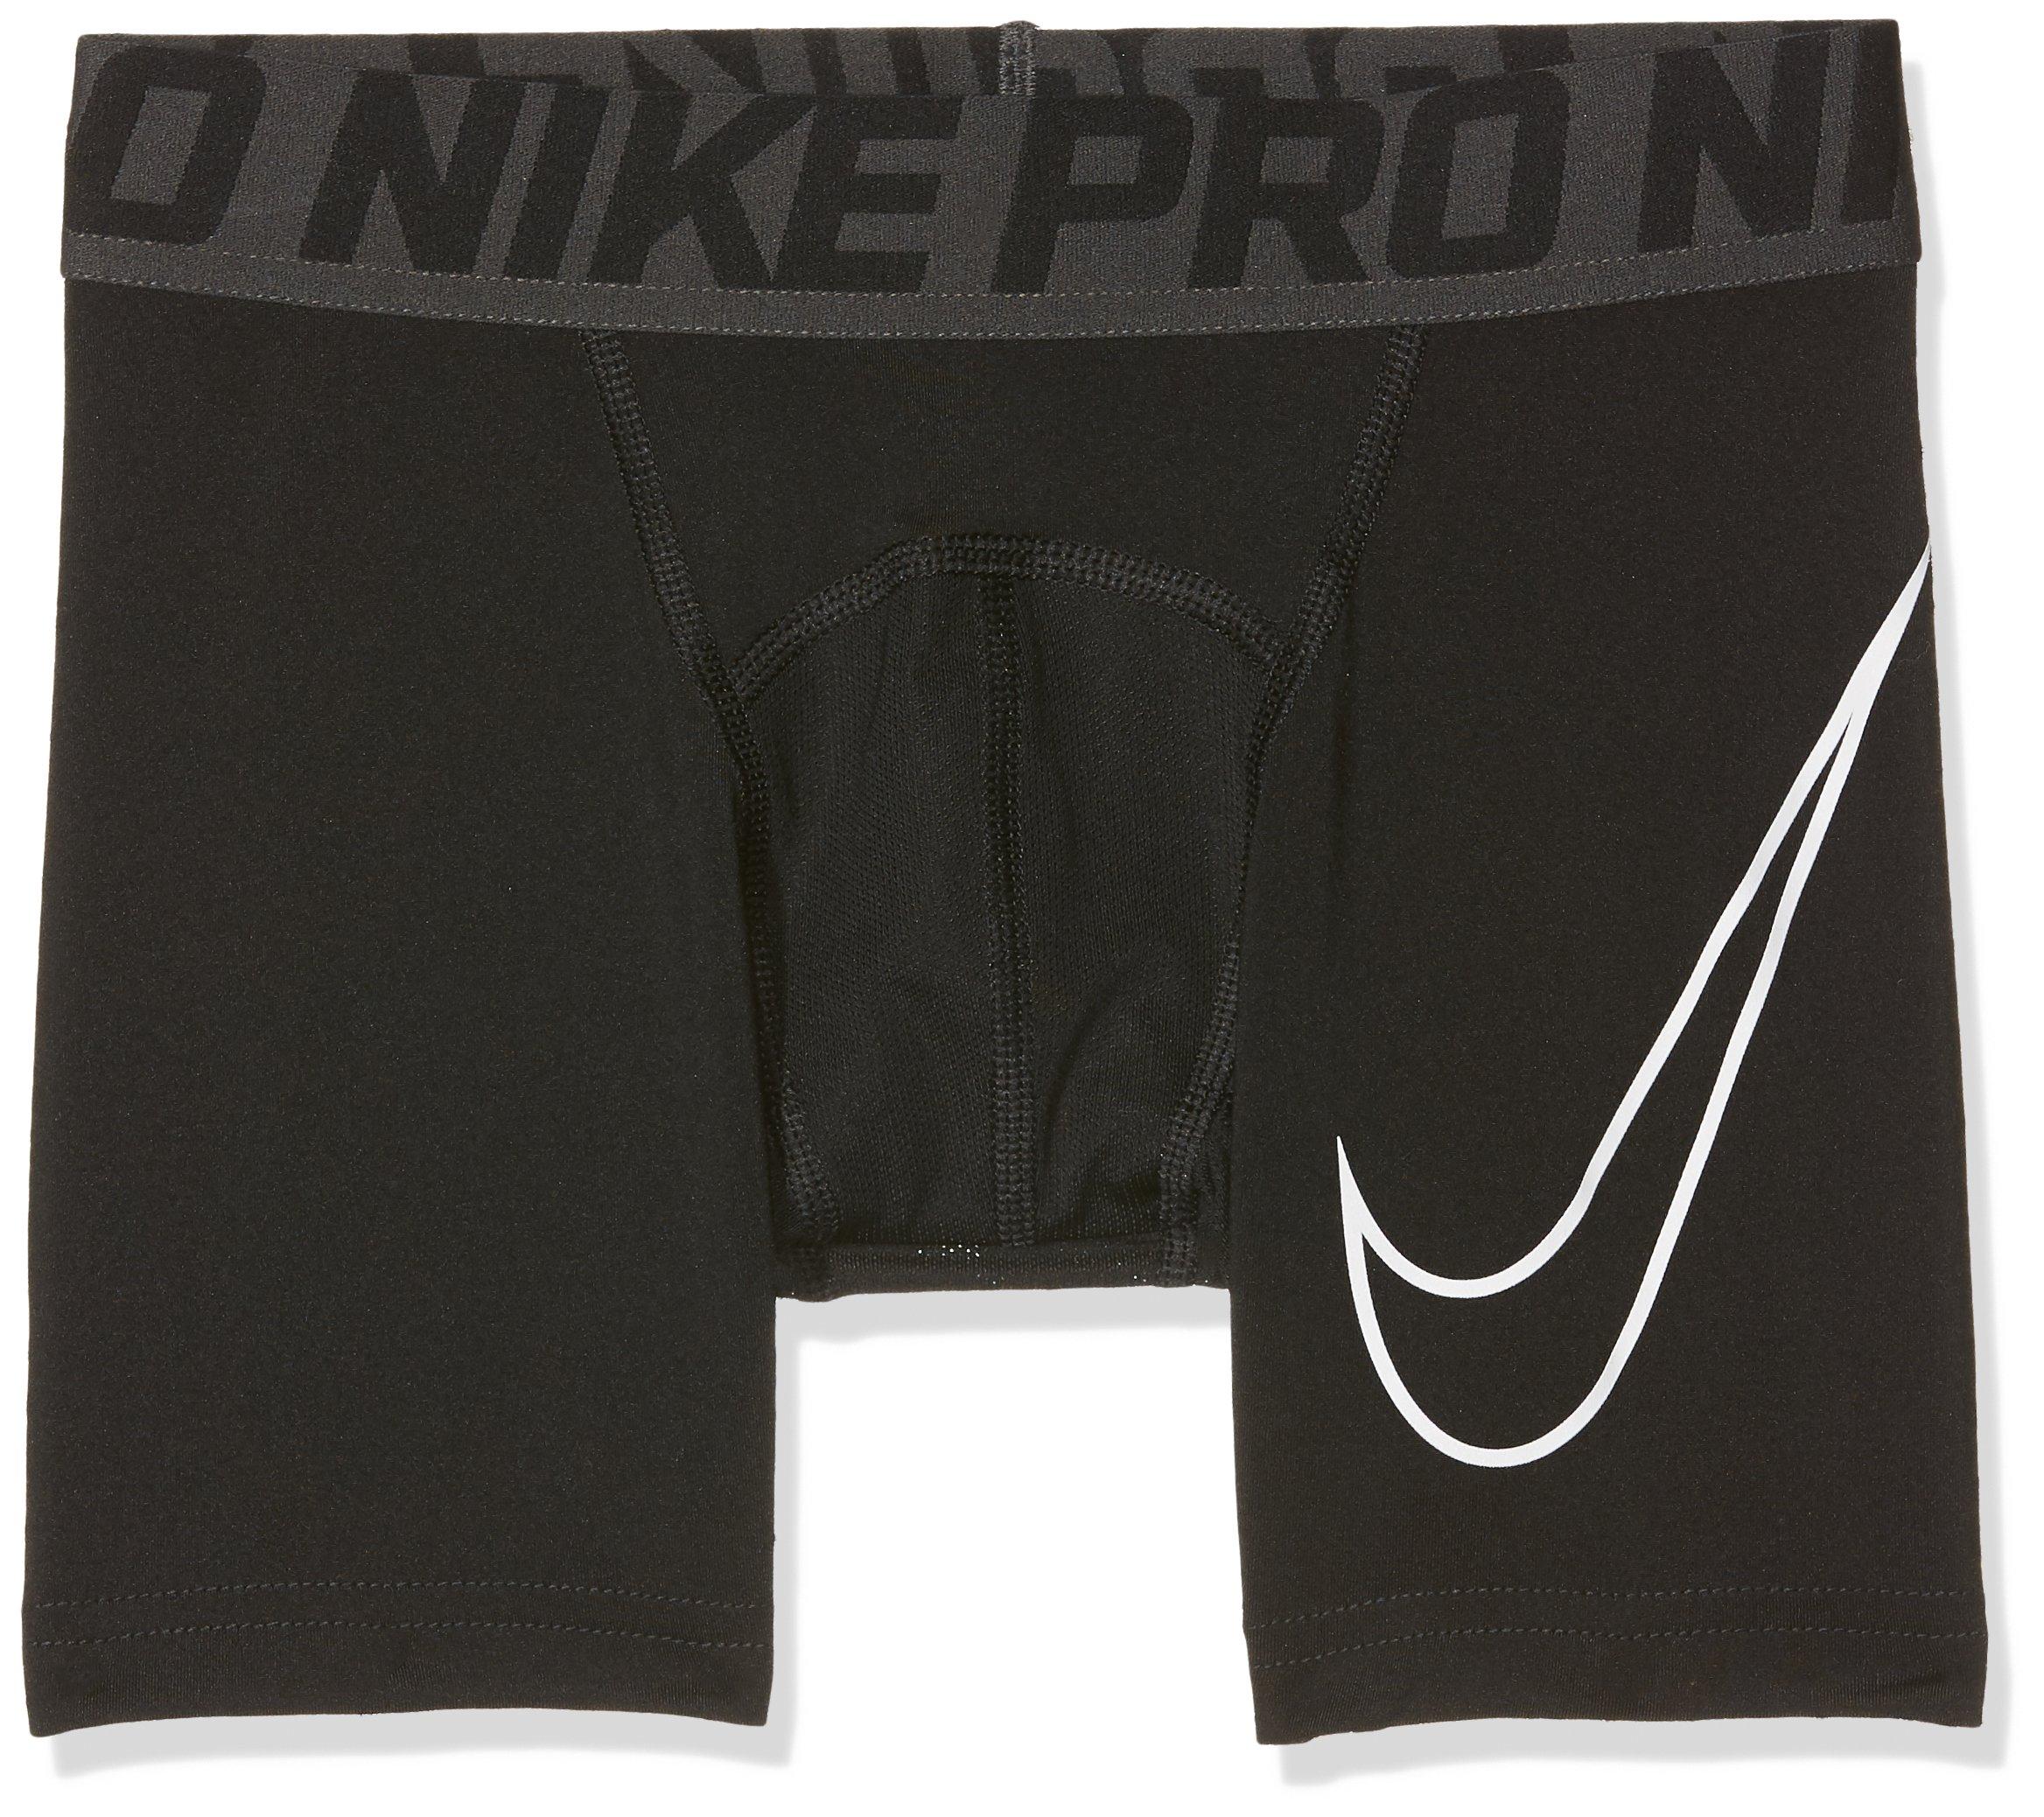 Nike Pro Big Kids' (Boys') Training Shorts,Black/White,X-Small (6X Little Kids) by Nike